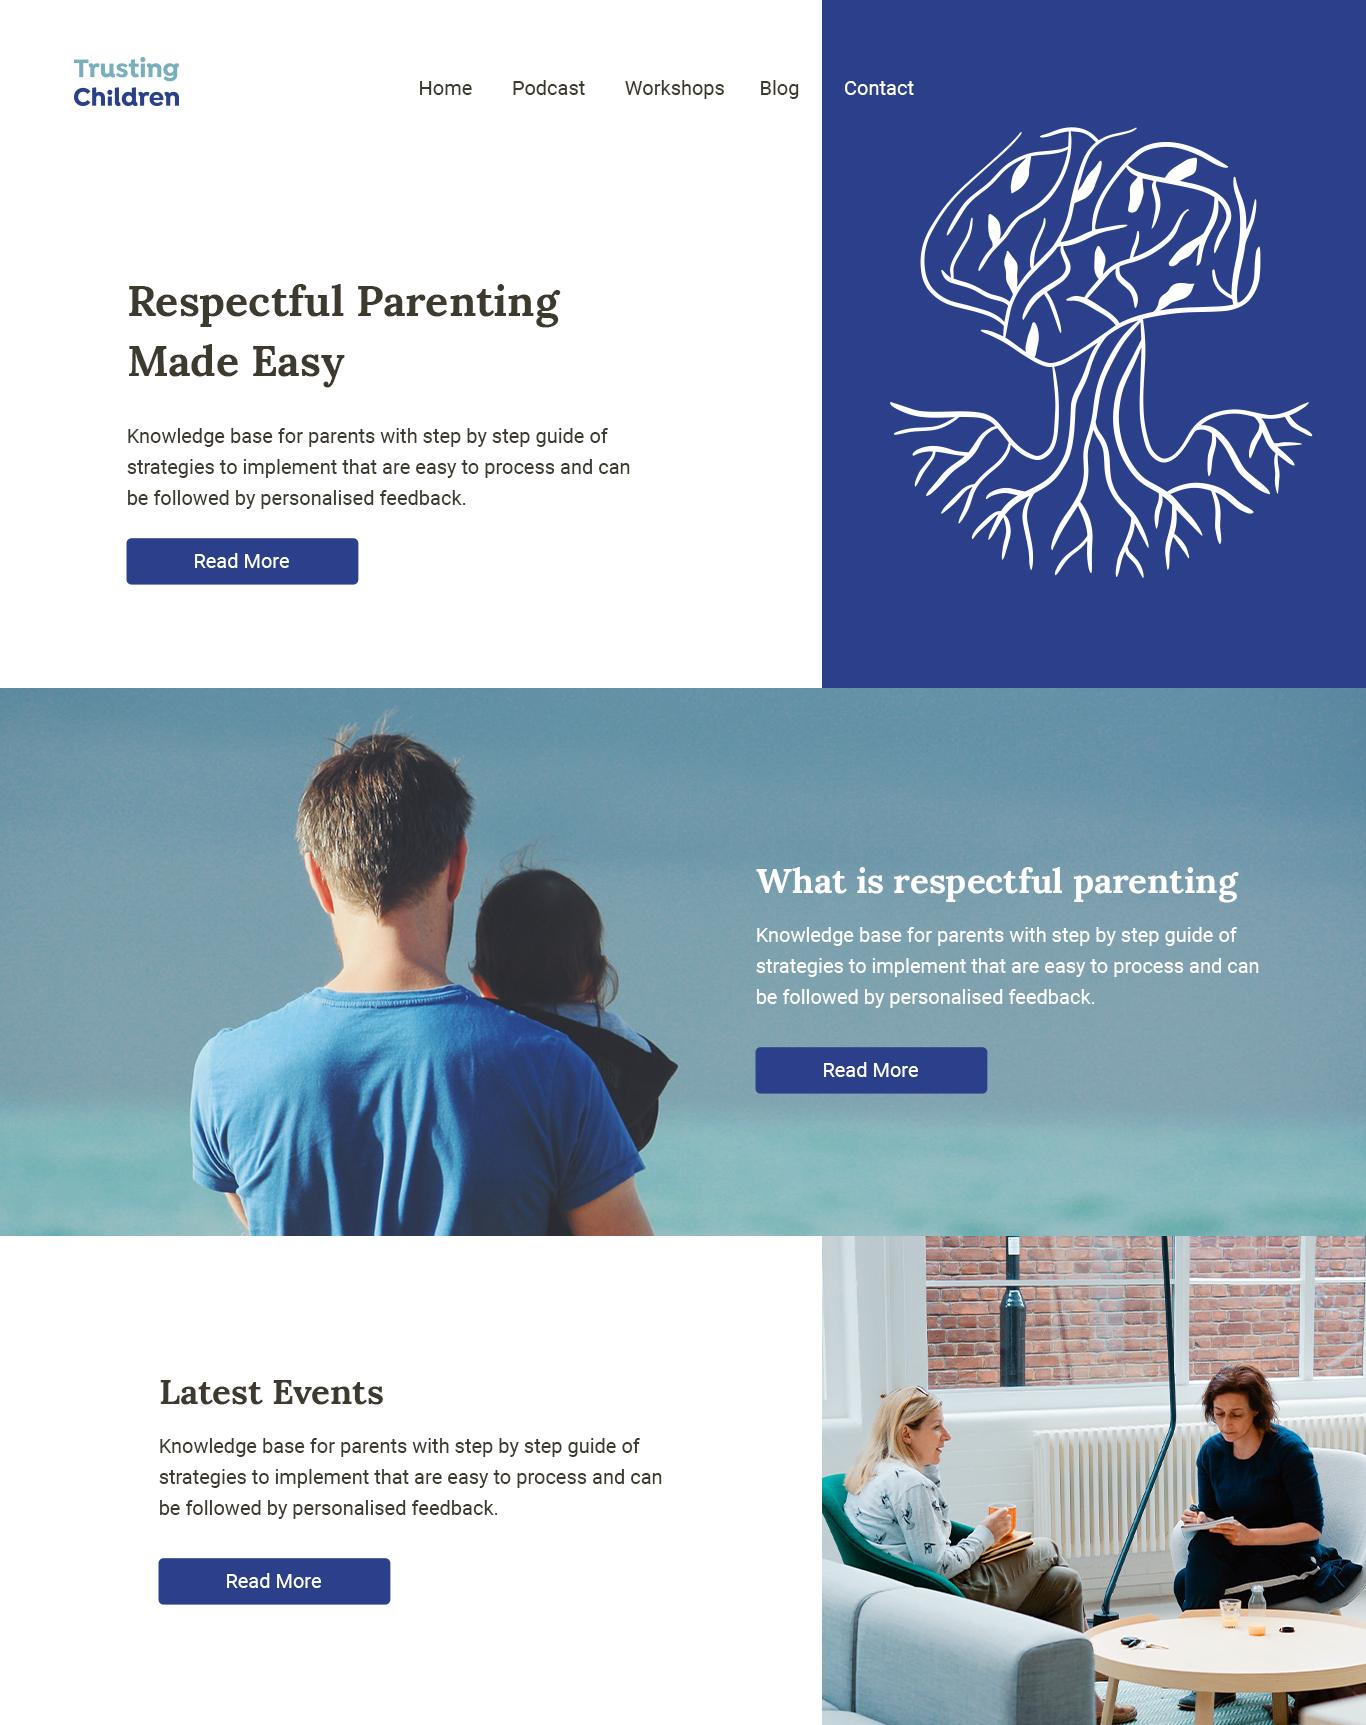 Trusting Children Website Design